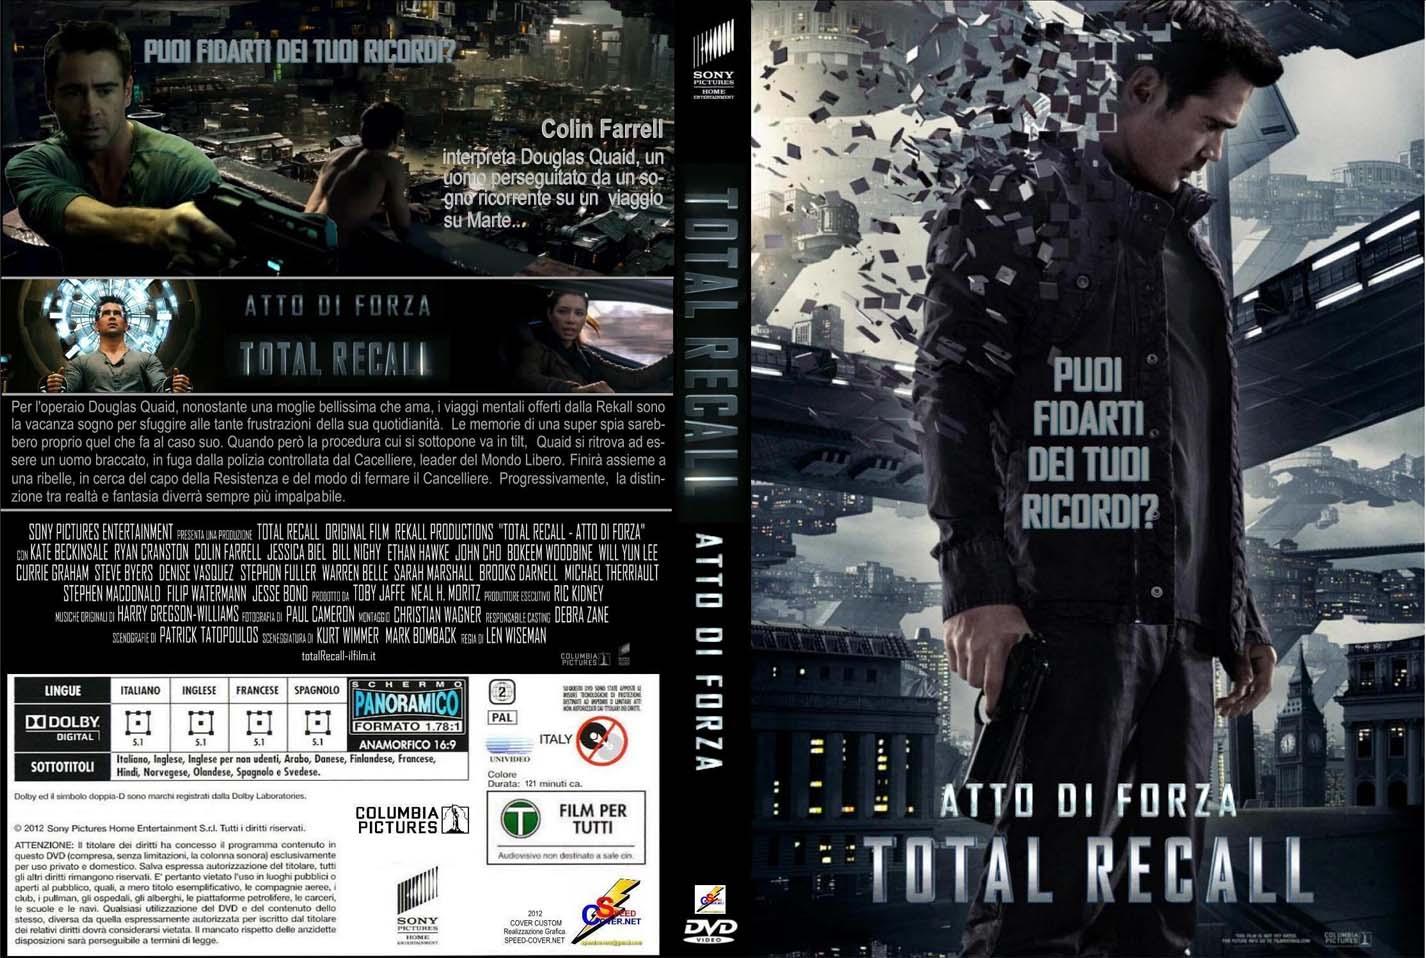 2012 movie cover - photo #16